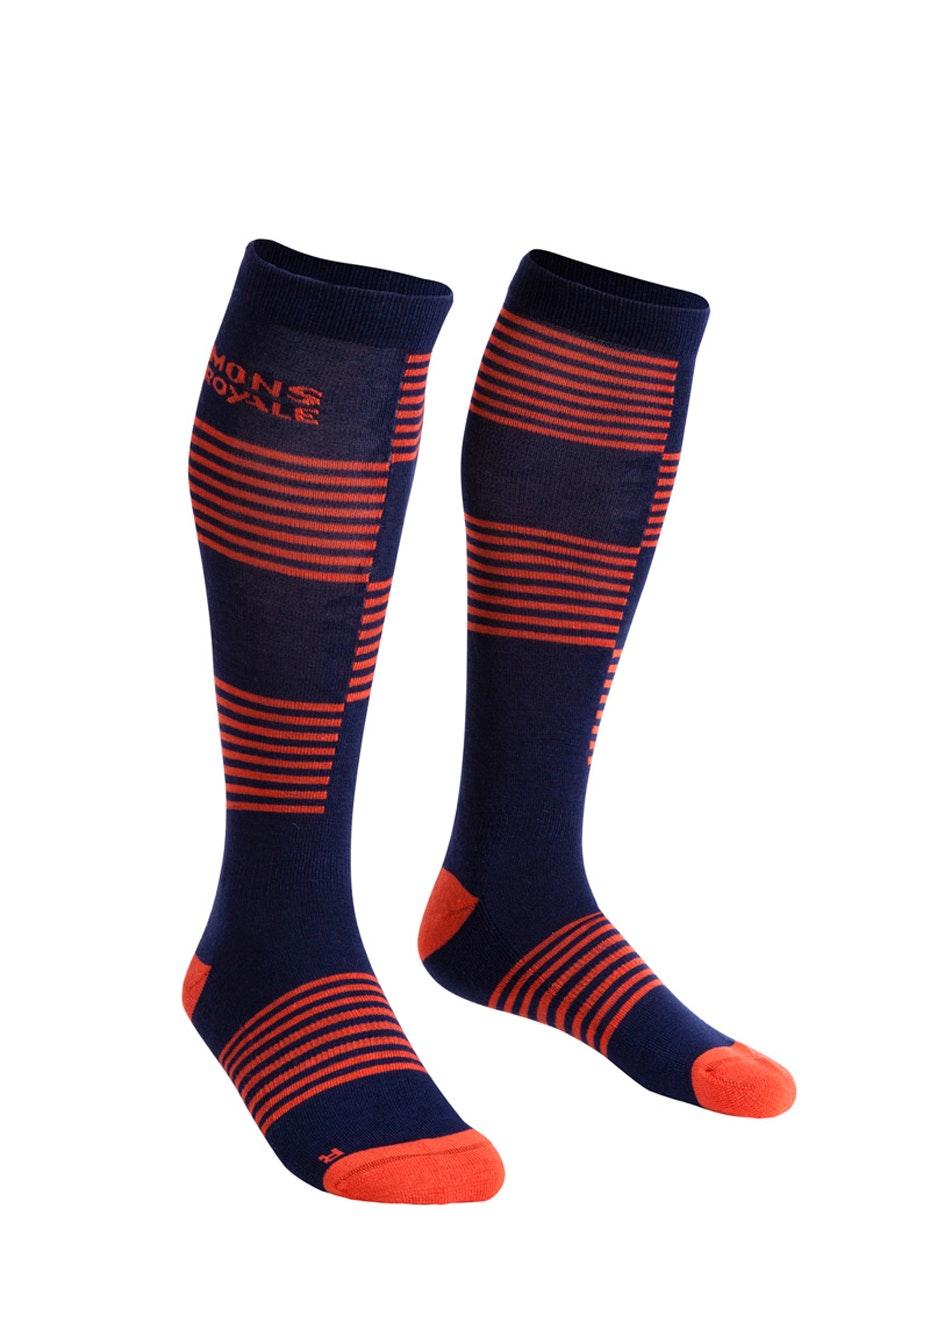 Mons Royale - Lift Access Sock - Navy / Spice